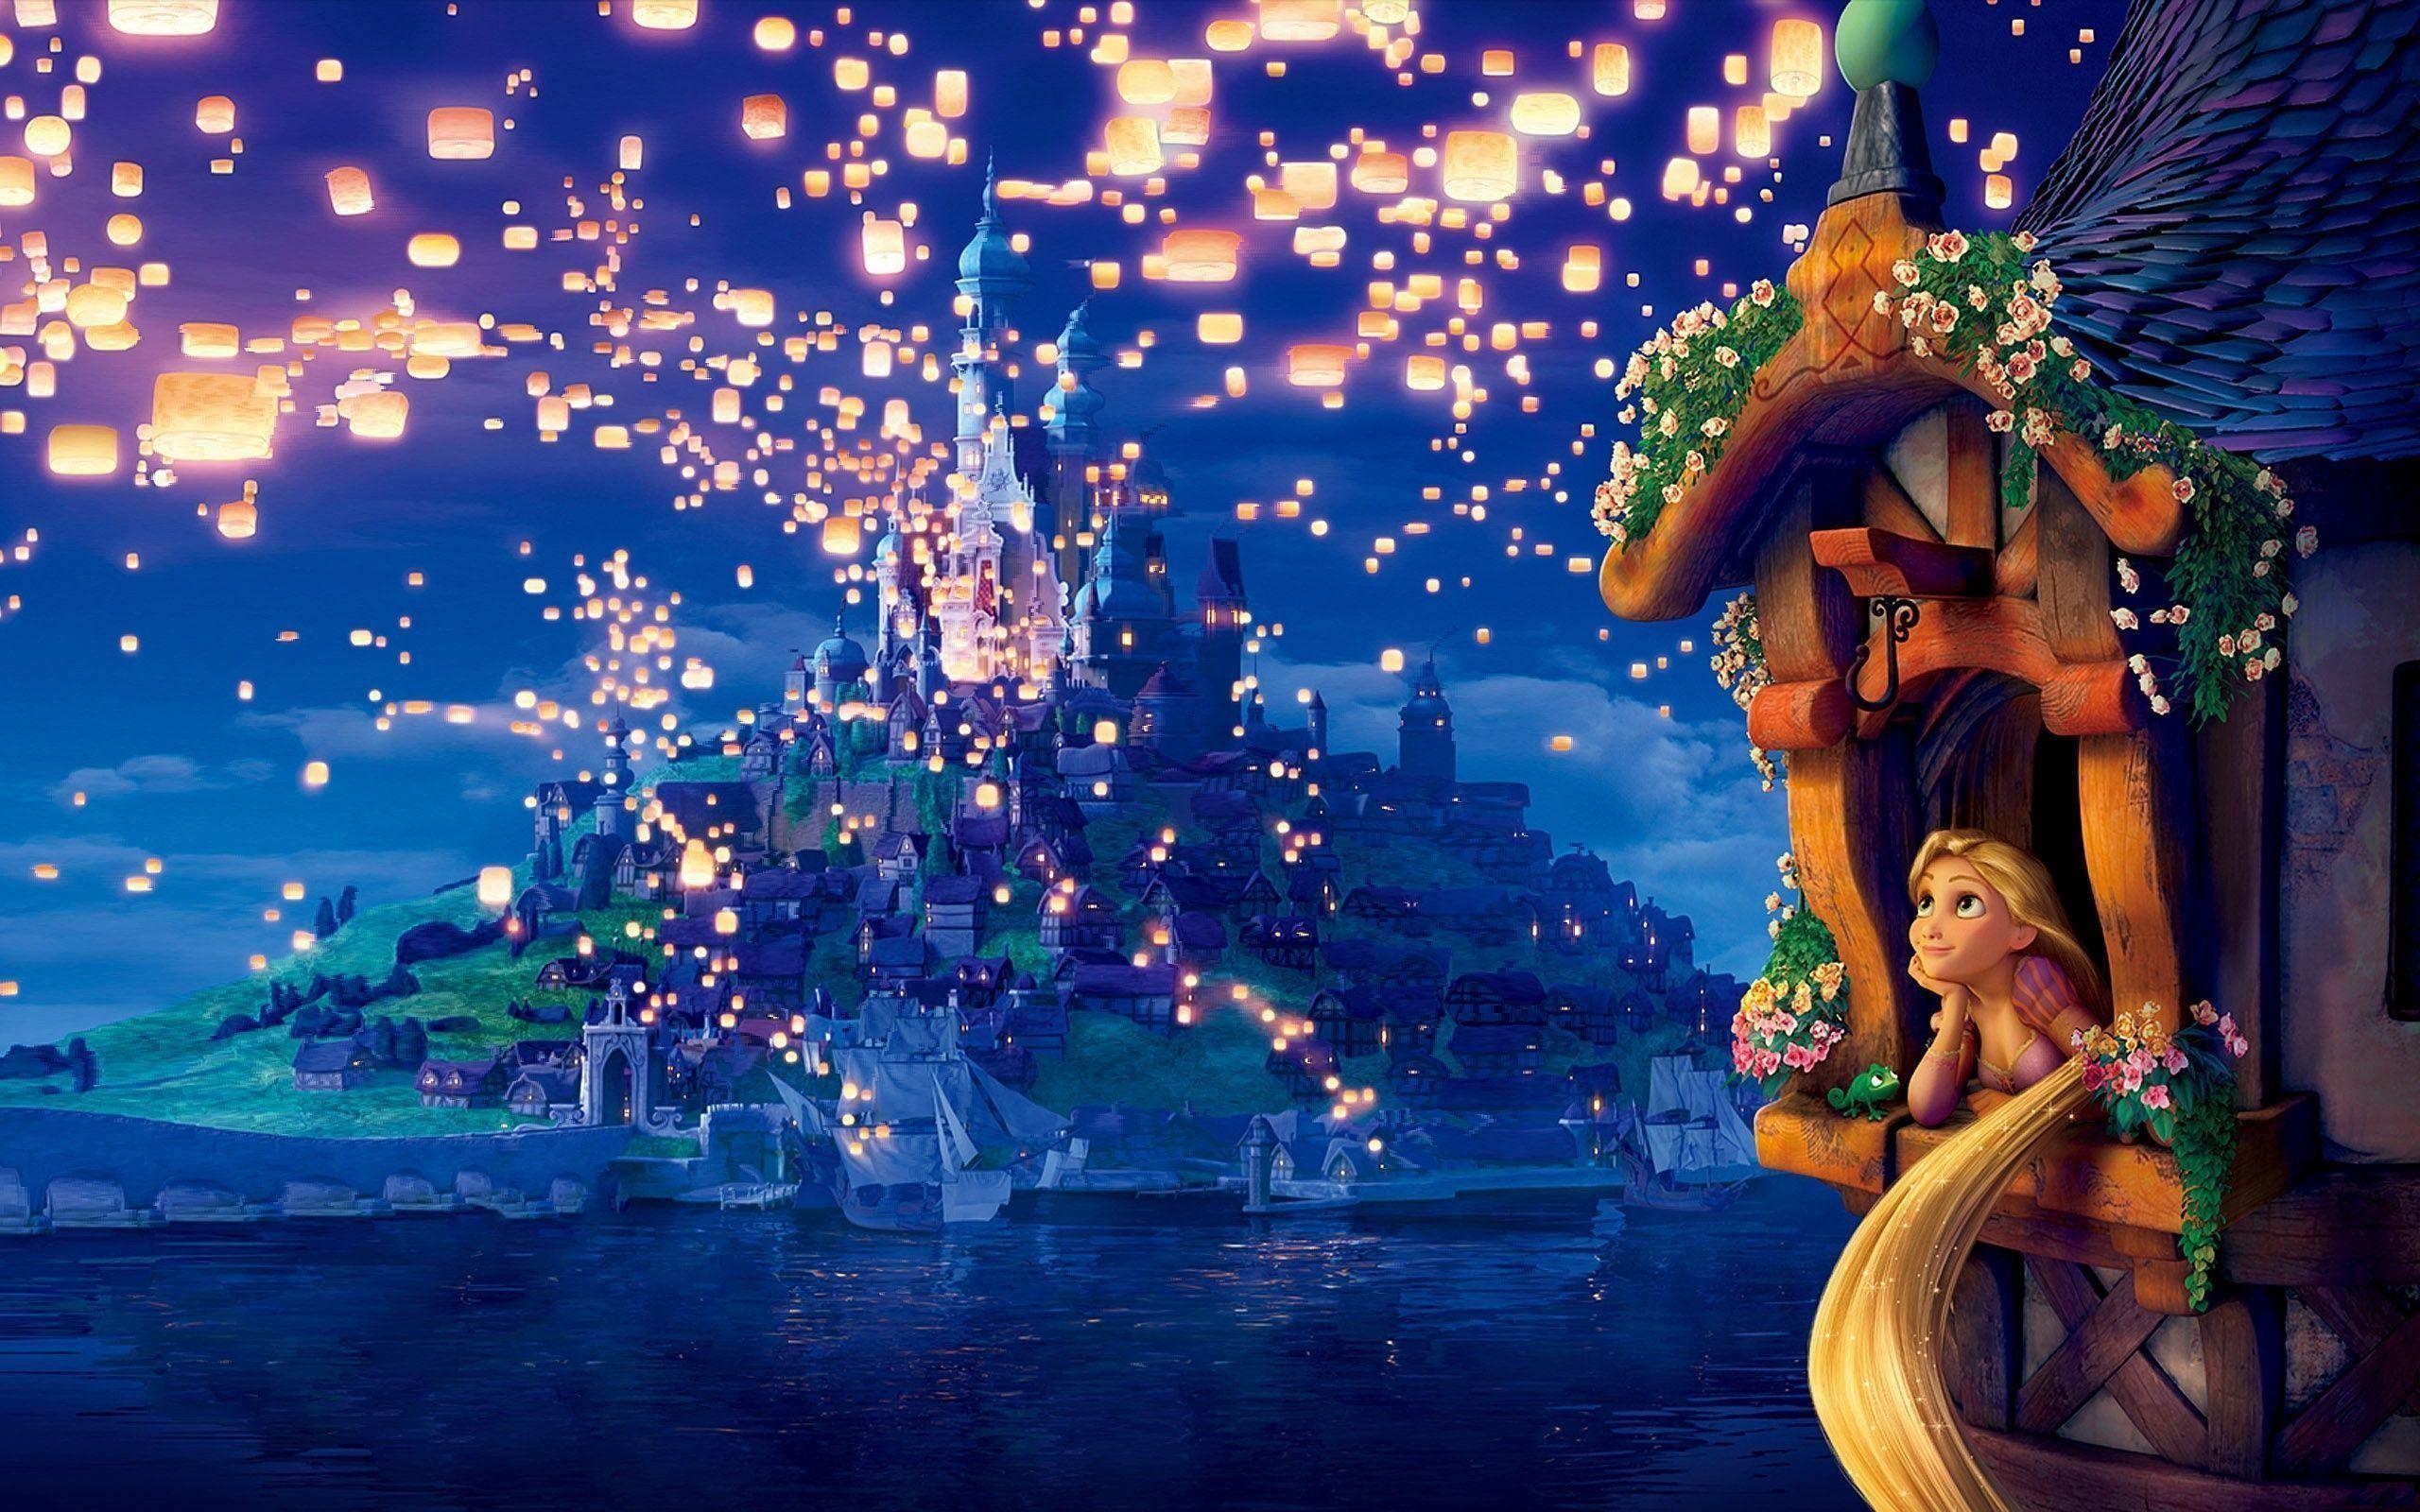 2560x1600 Disney Rapunzel Wallpaper Border 14016 Full HD Desktop